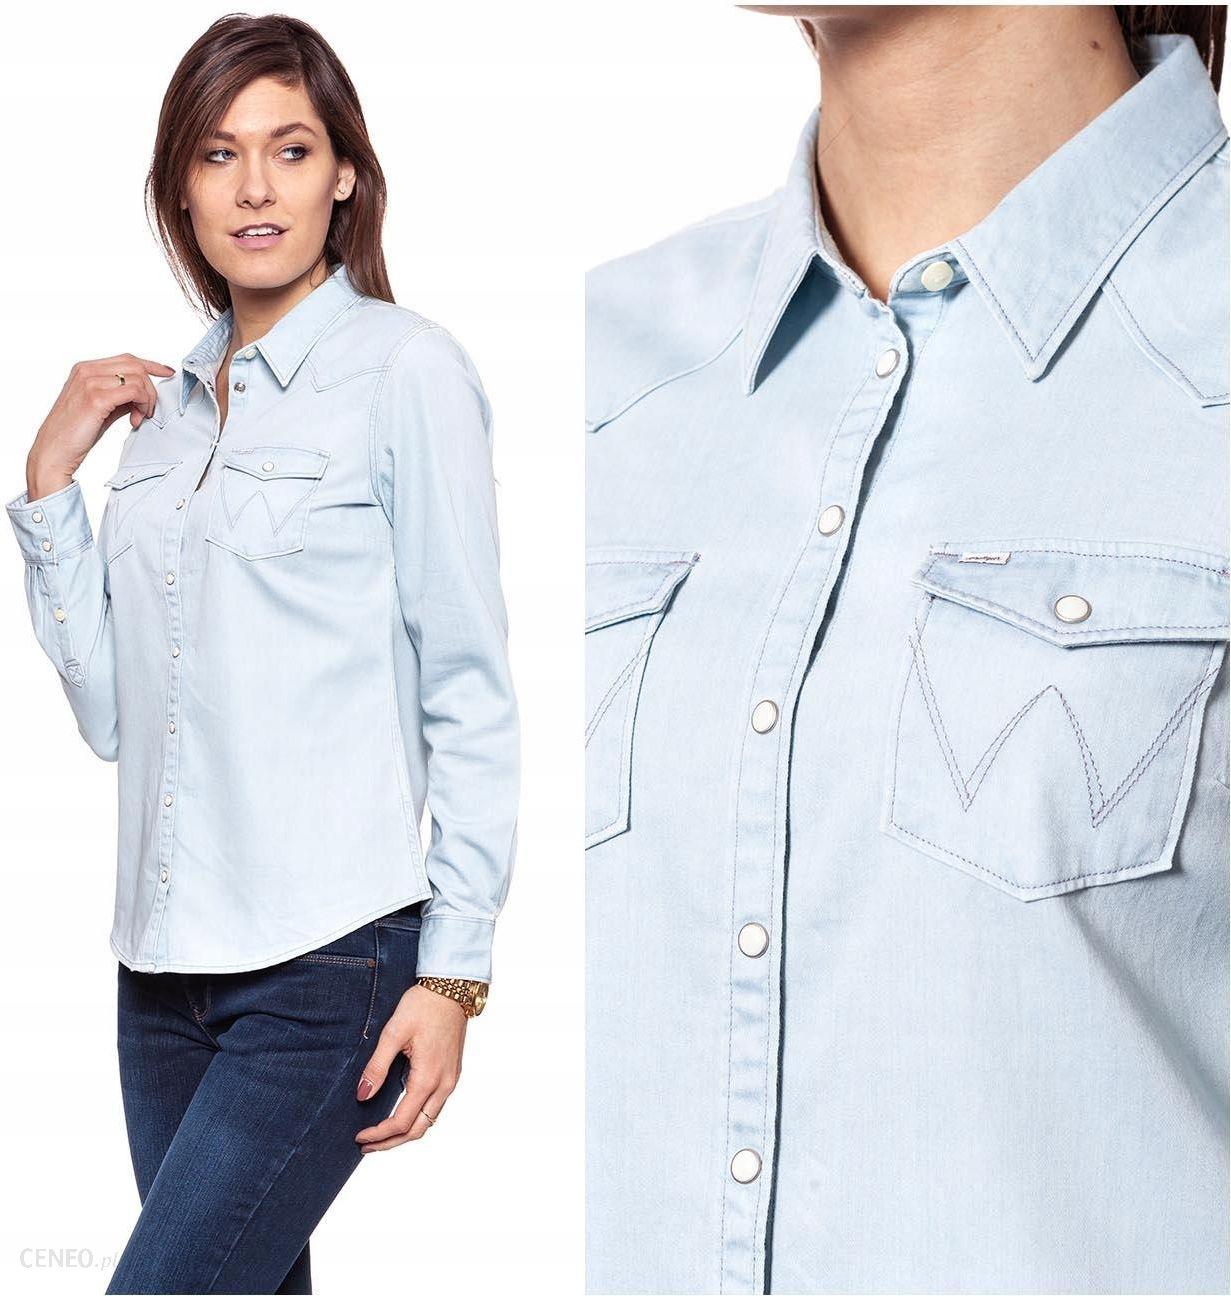 Wrangler Western Shirt Koszula Damska Jeans M Ceny i  B1mYi